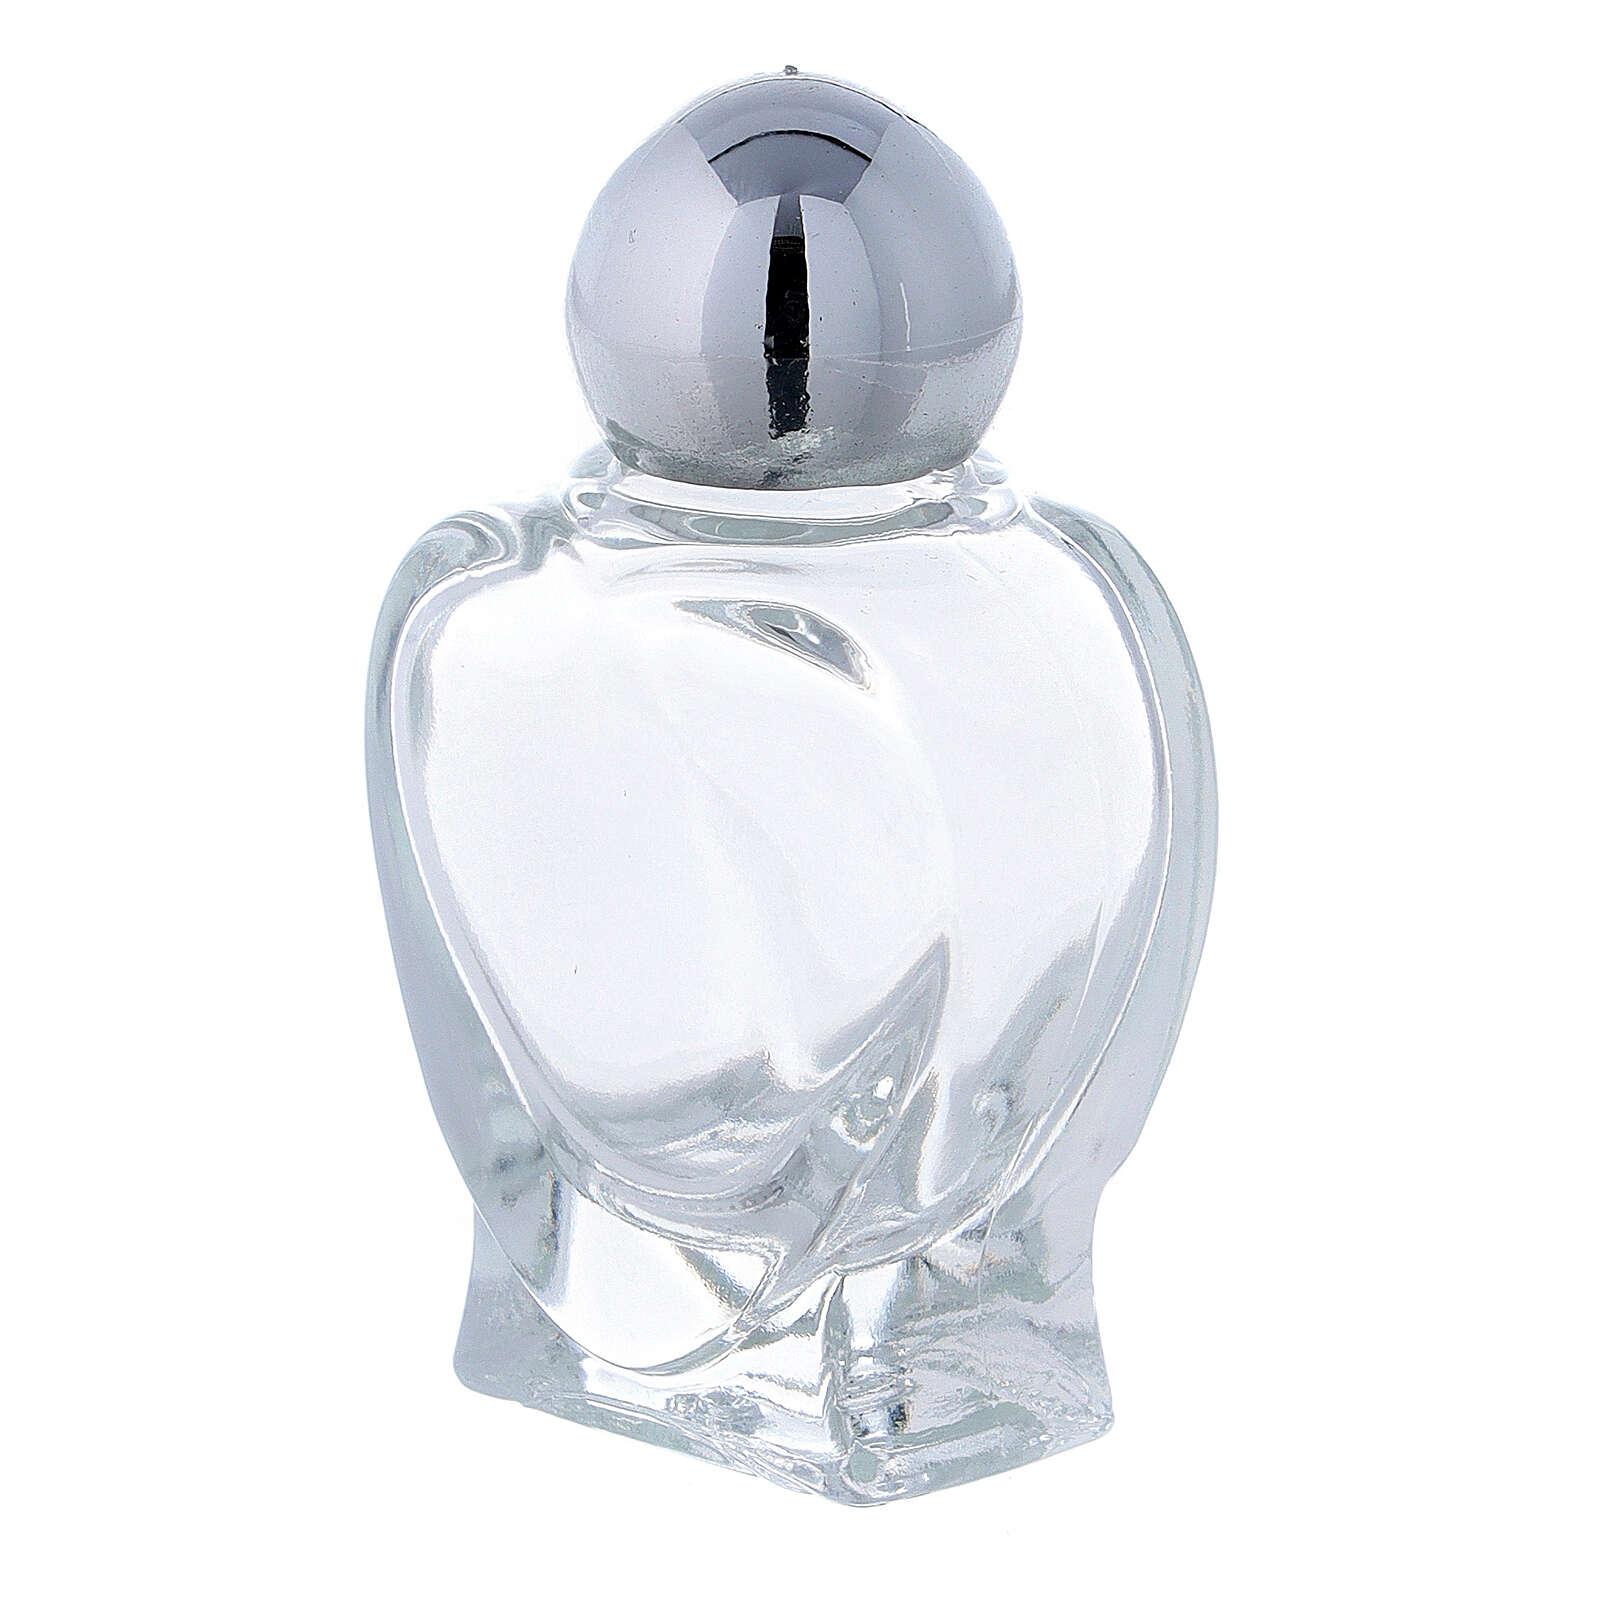 Botella agua bendita en forma de corazón 10 ml (CAJA 50 PIEZAS) vidrio 3